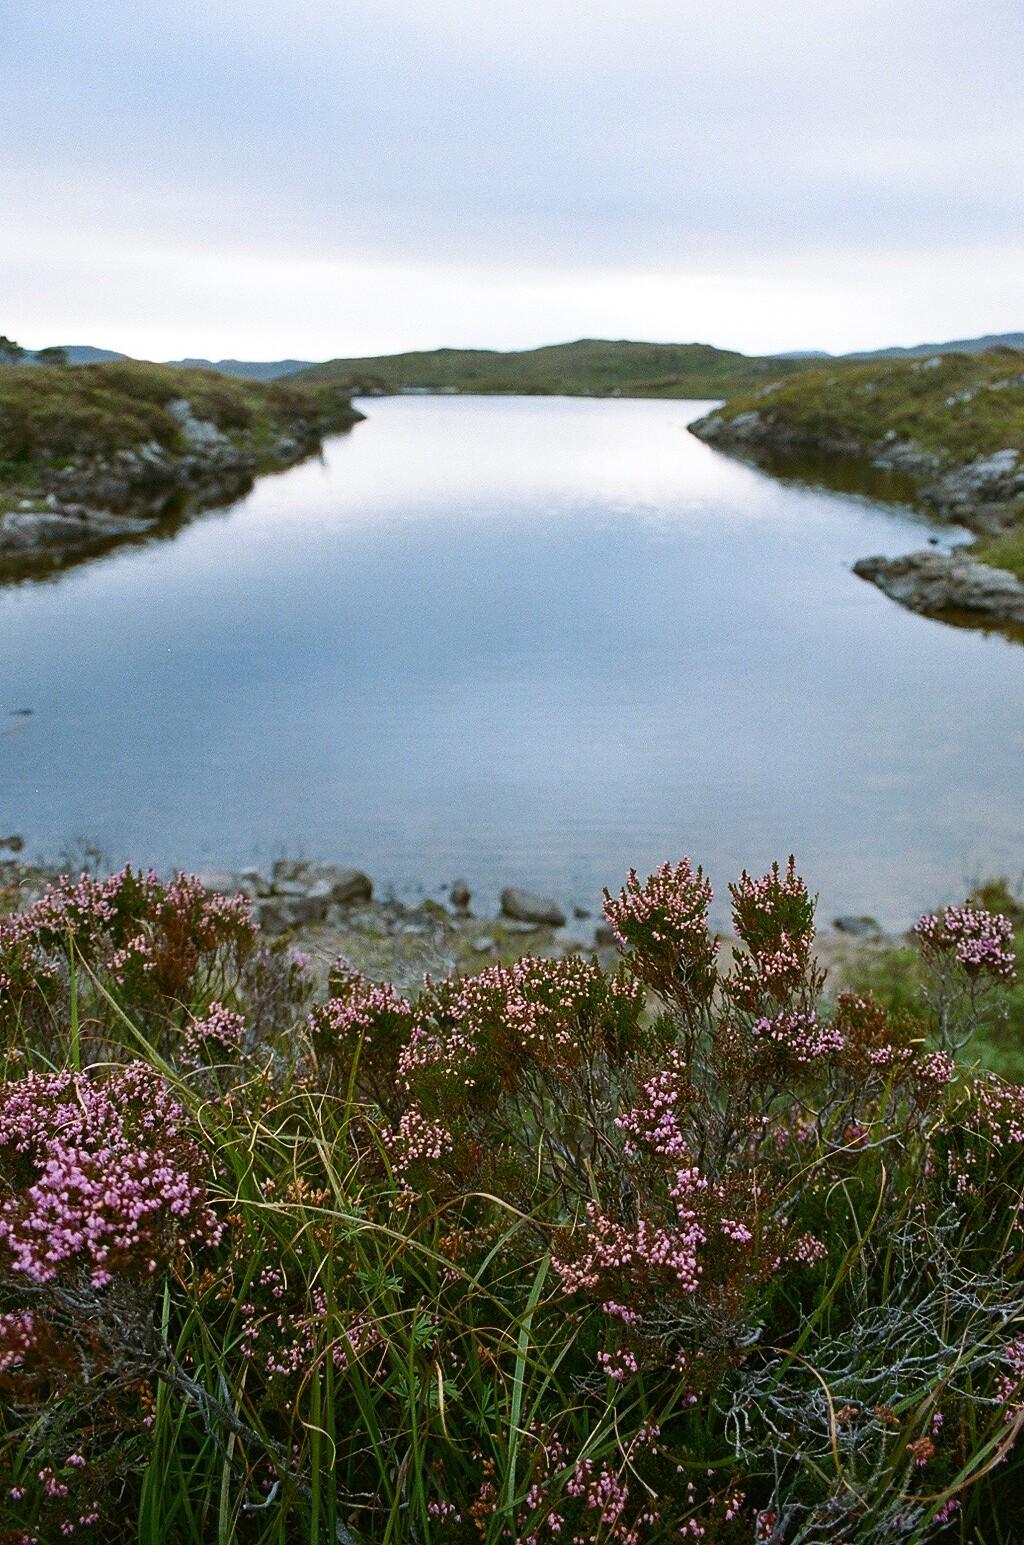 The Little Magpie Scotland Photo Diary North Coast 500 16